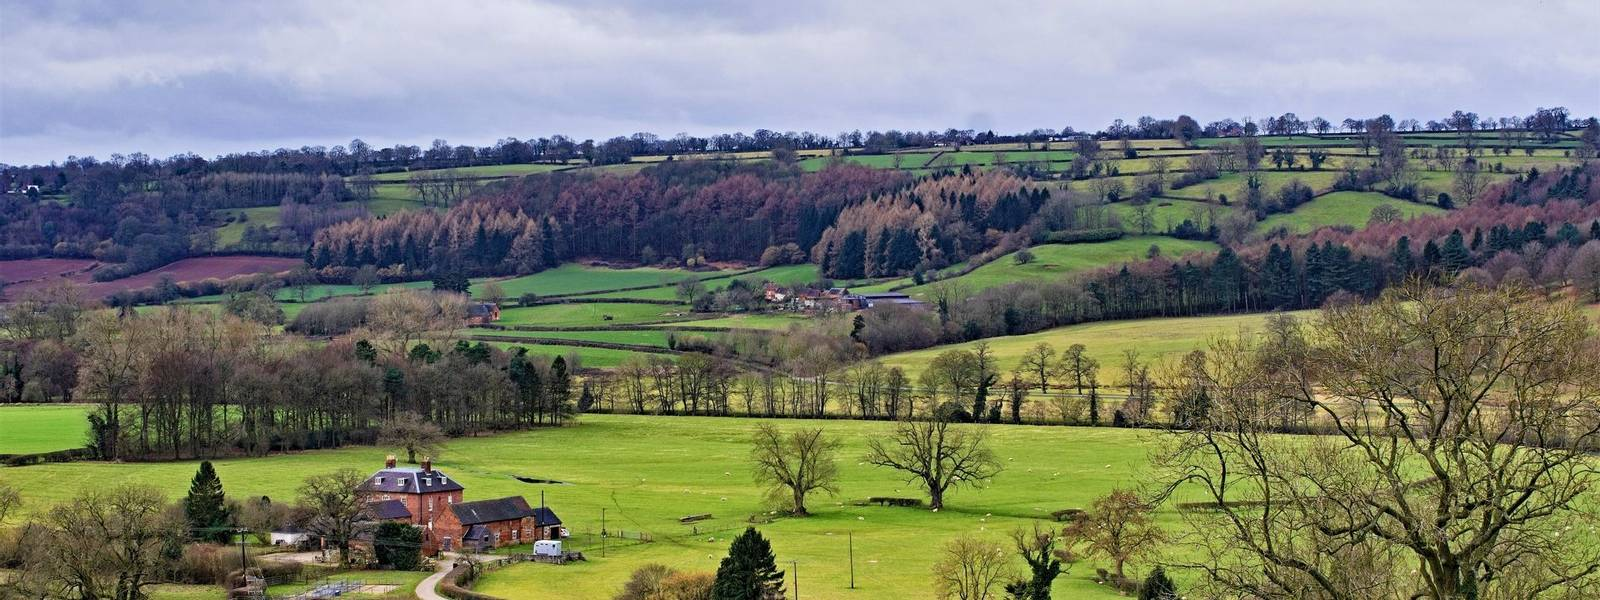 Dovedale - Peak District - Spring and Winter - AdobeStock_273181843.jpeg